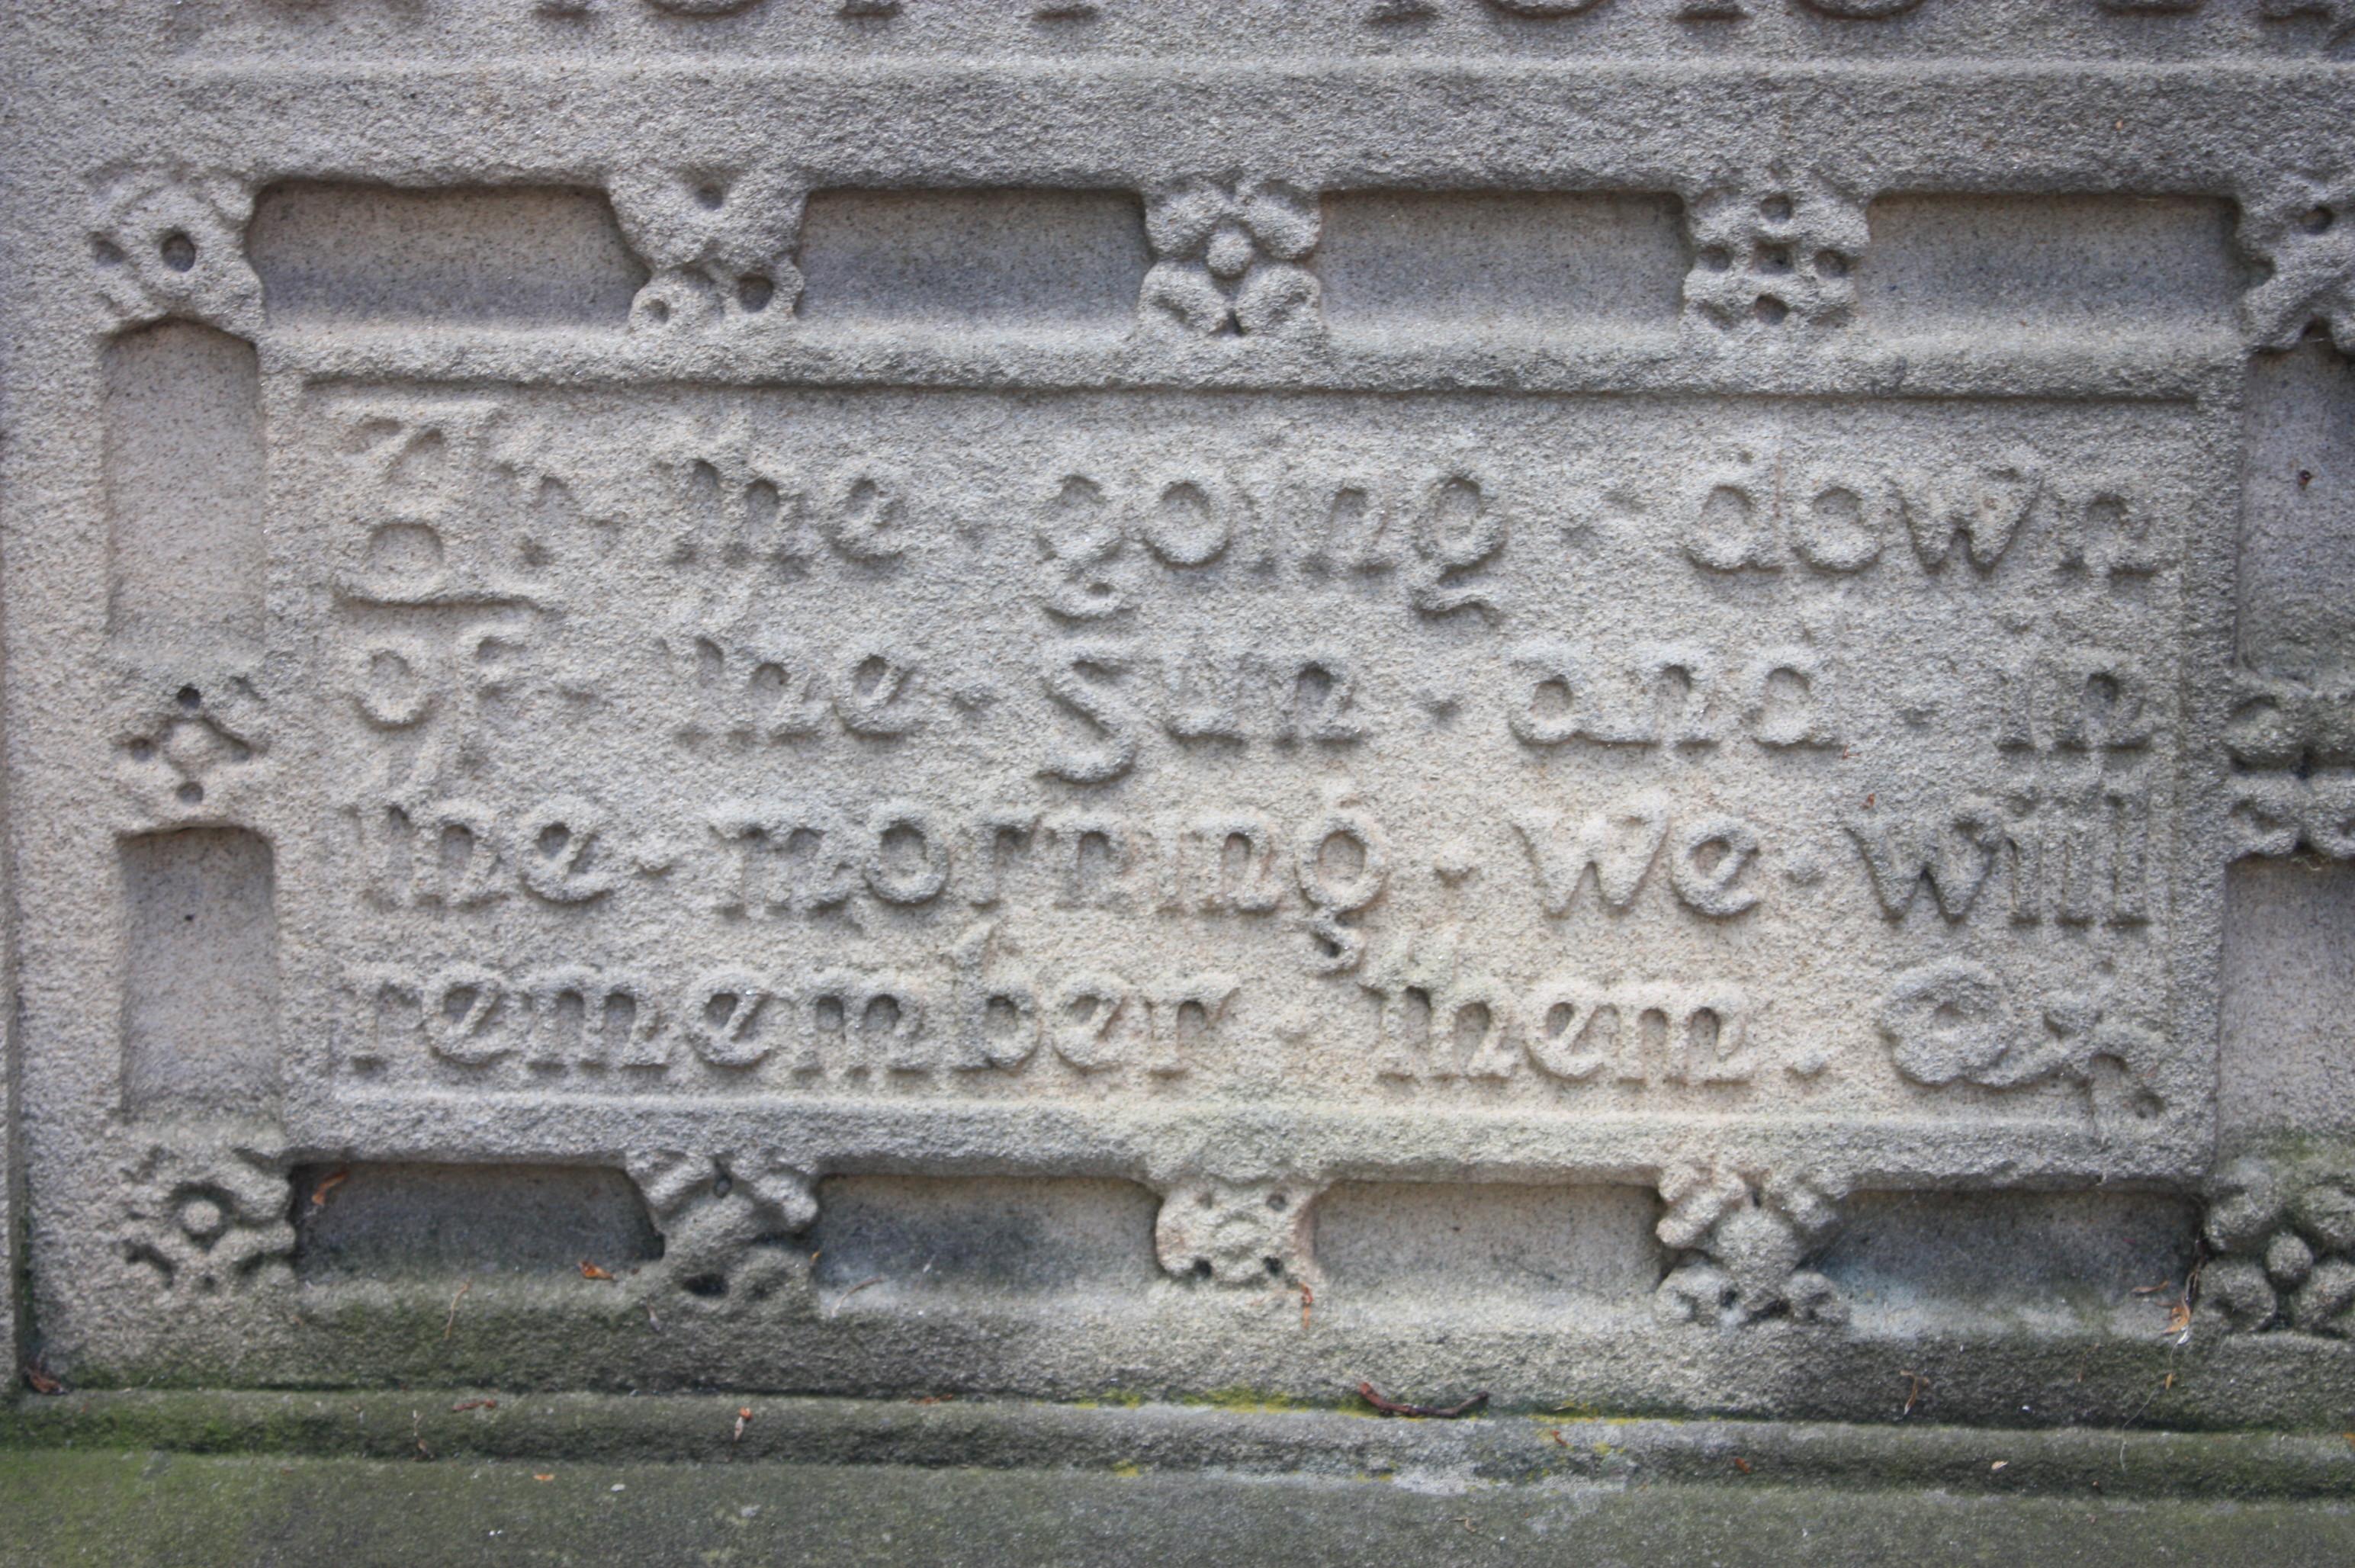 For the Fallen - Wikipedia